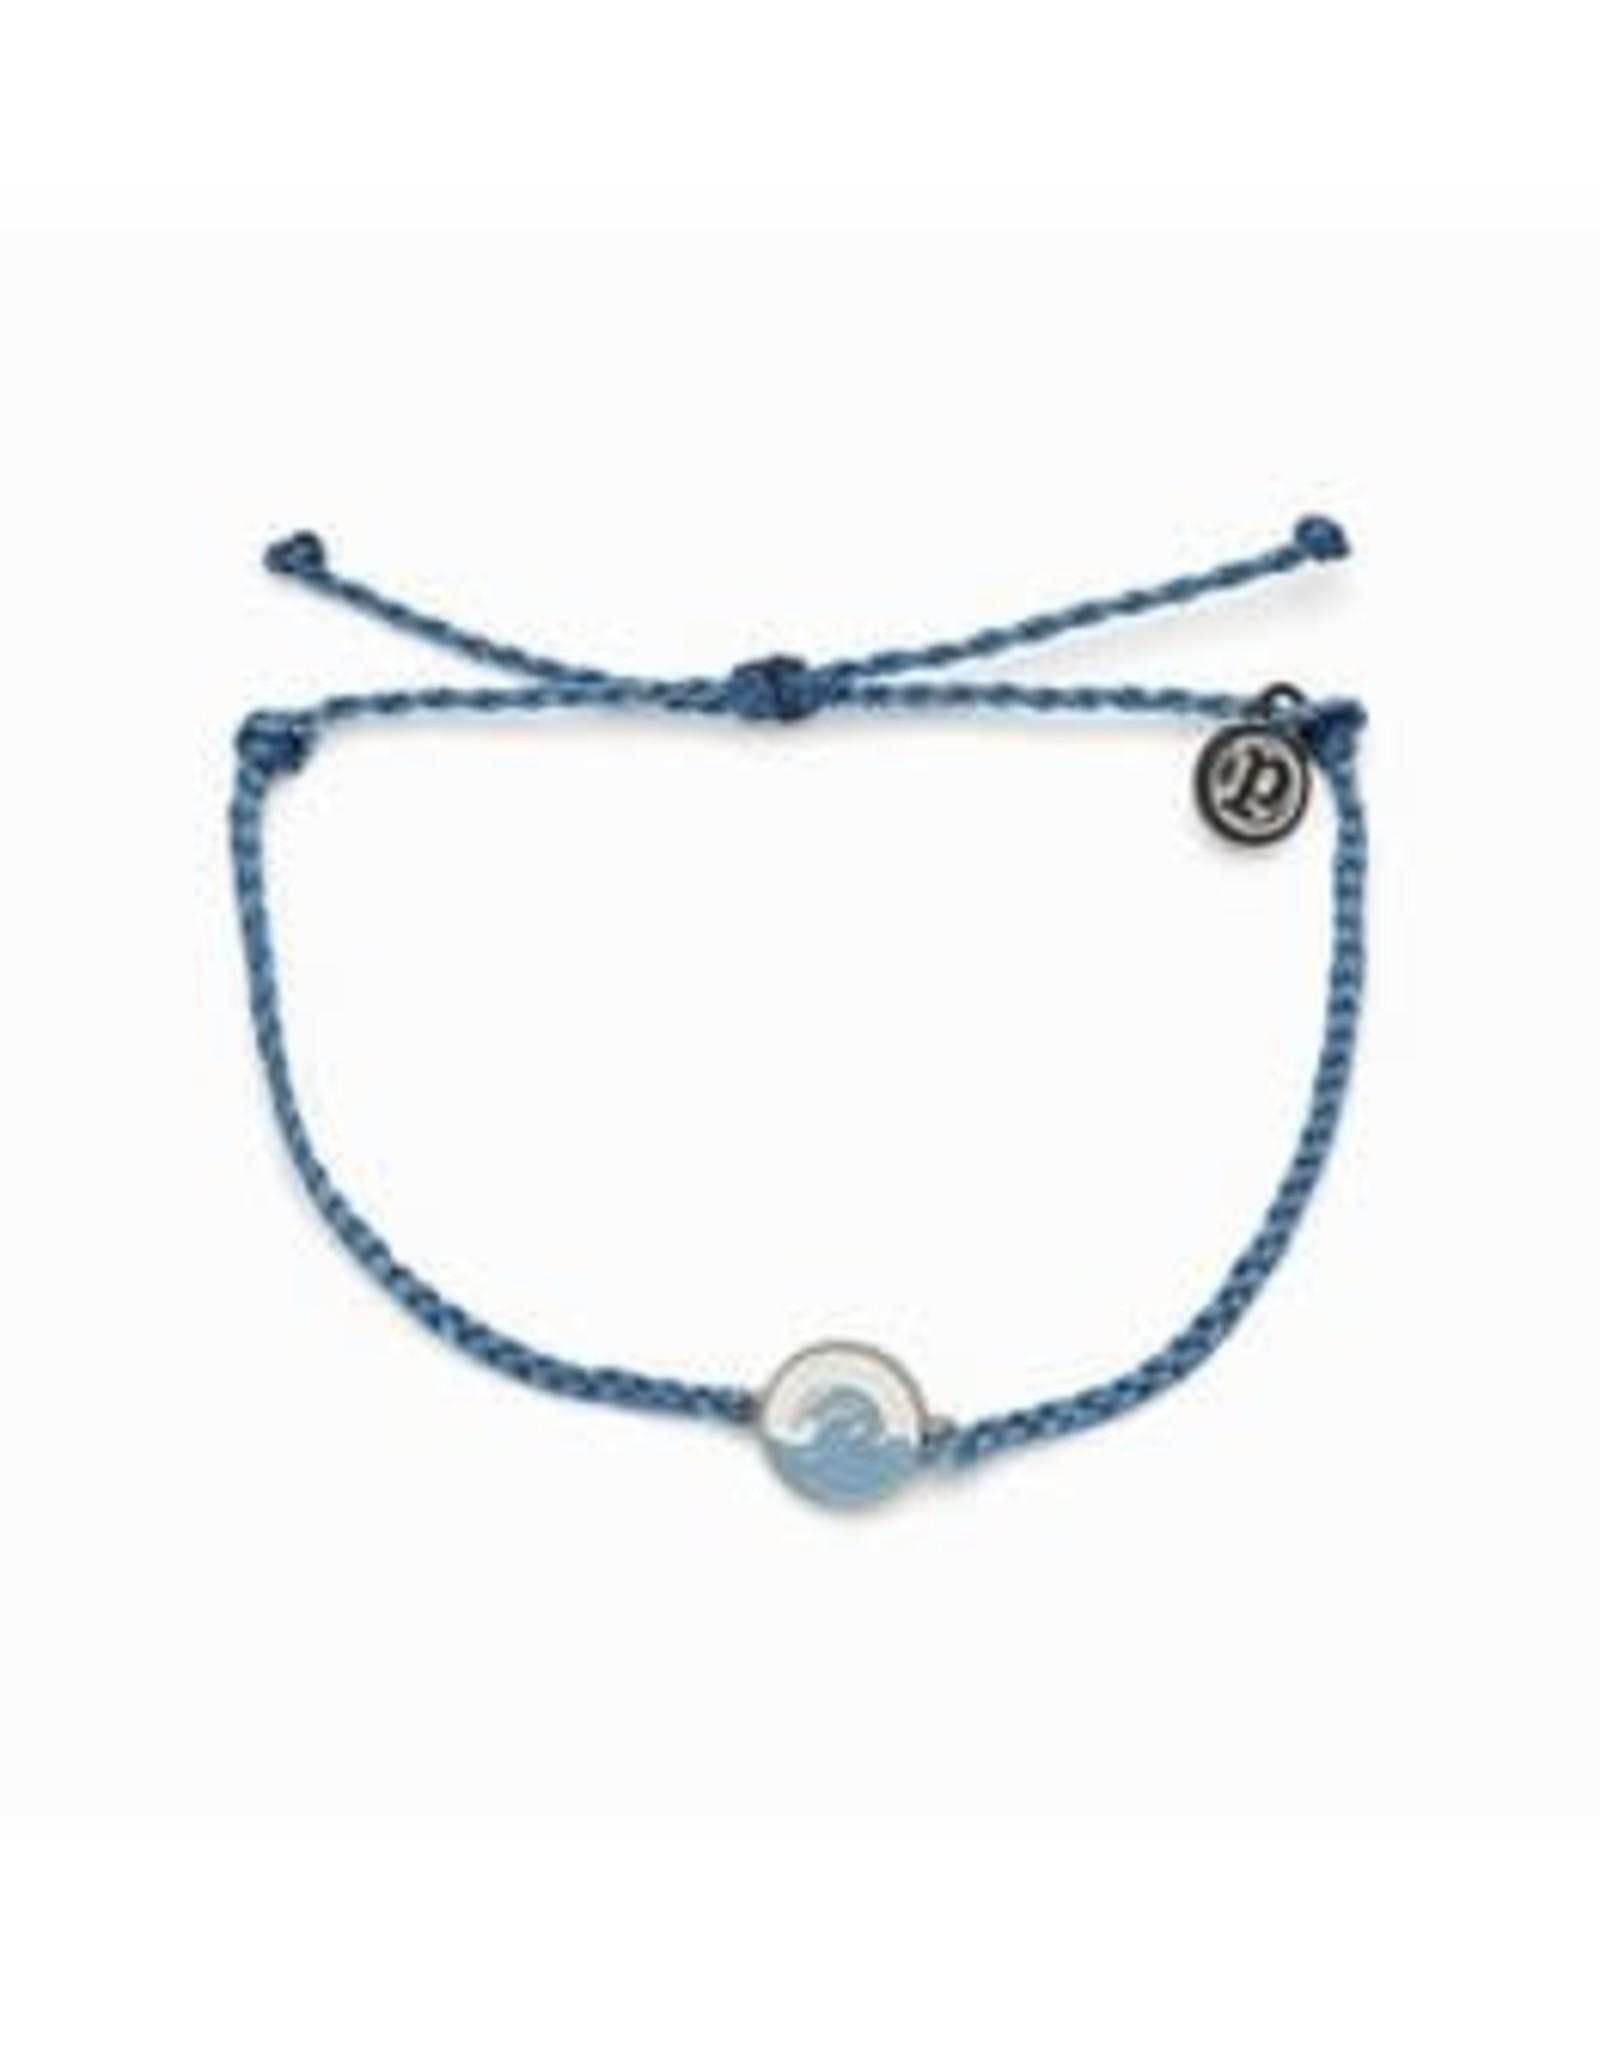 Pura Vida Make Waves Silver Bracelet